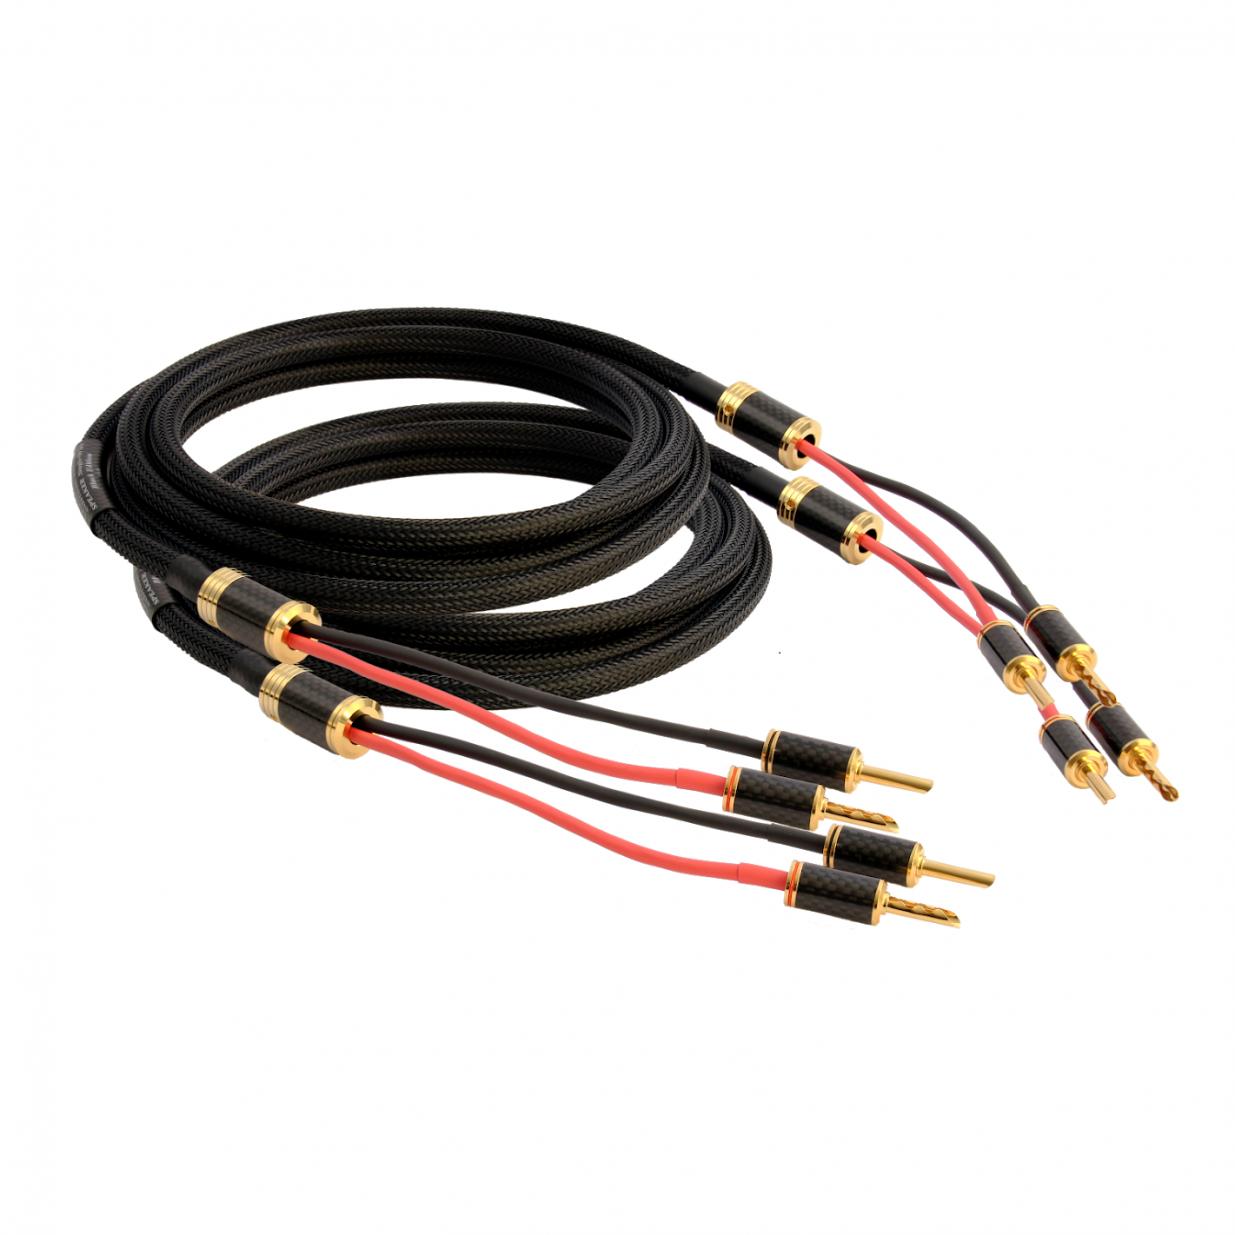 Кабель акустический Goldkabel Black Edition SC Single-Wire 4,5m